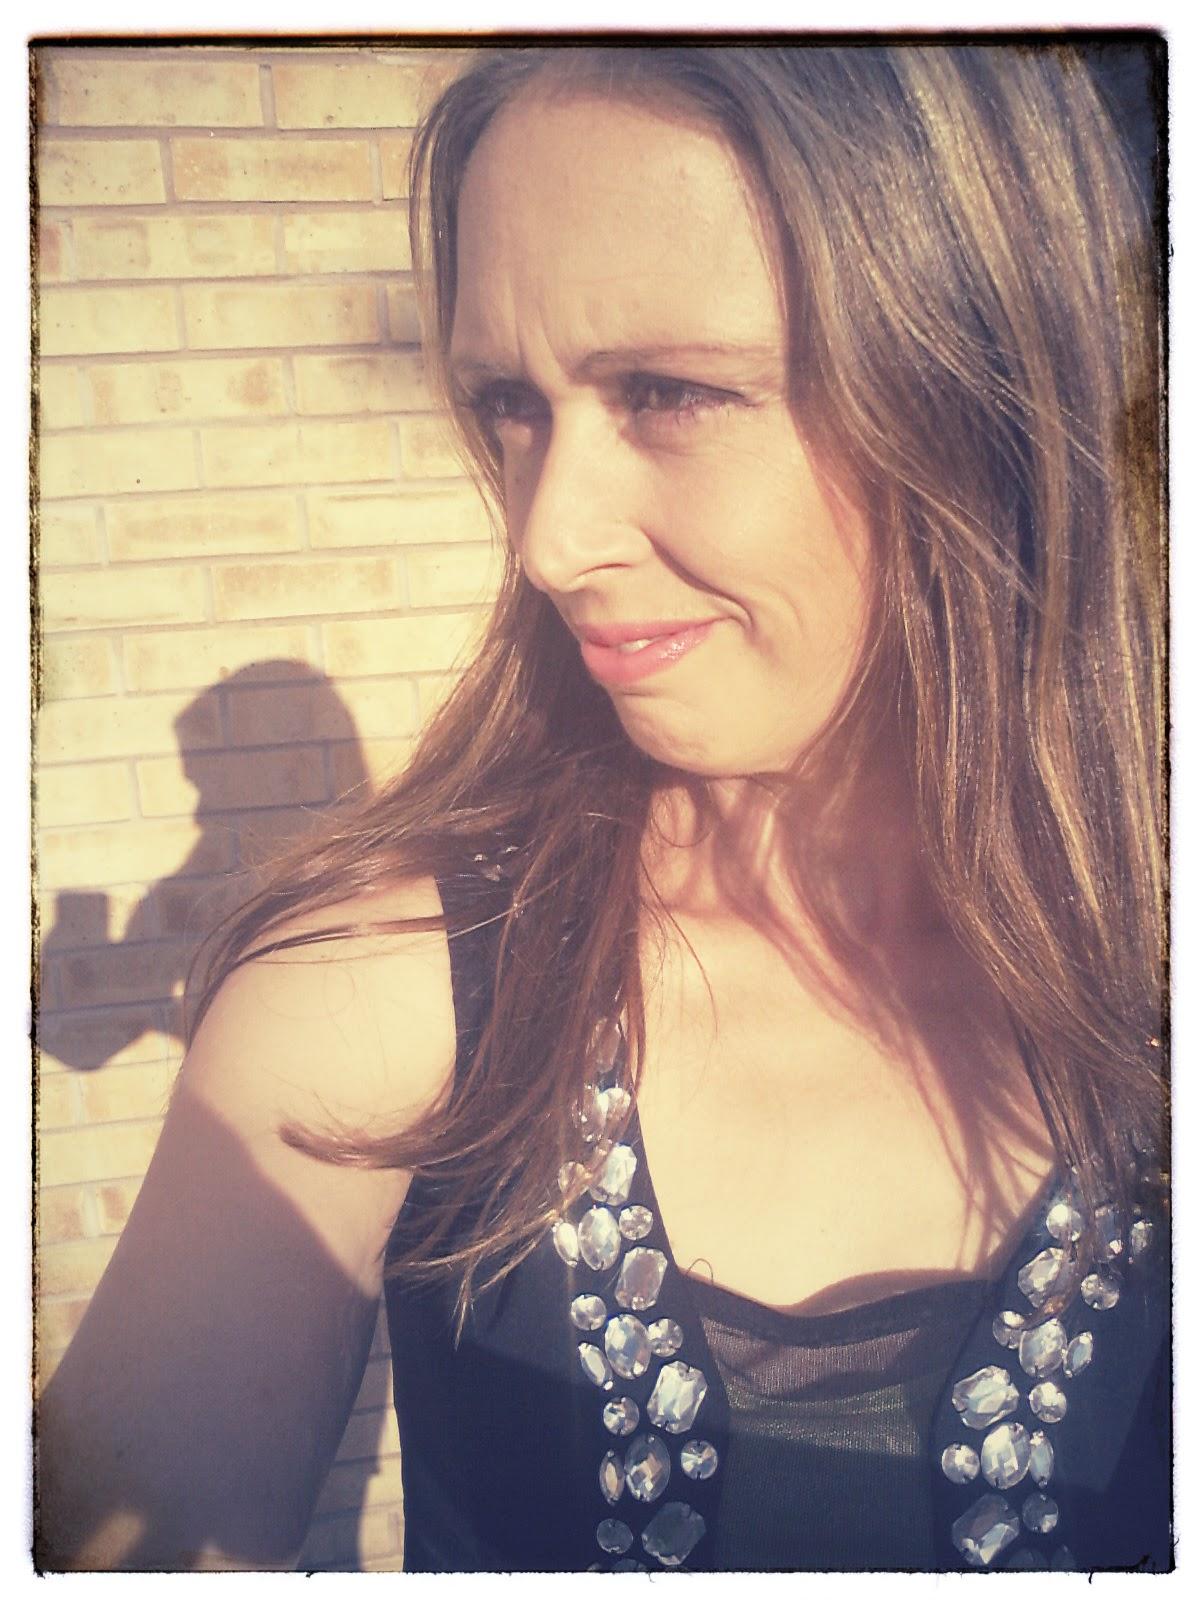 LBD Selfies: Little Black Dress And Summer Selfies